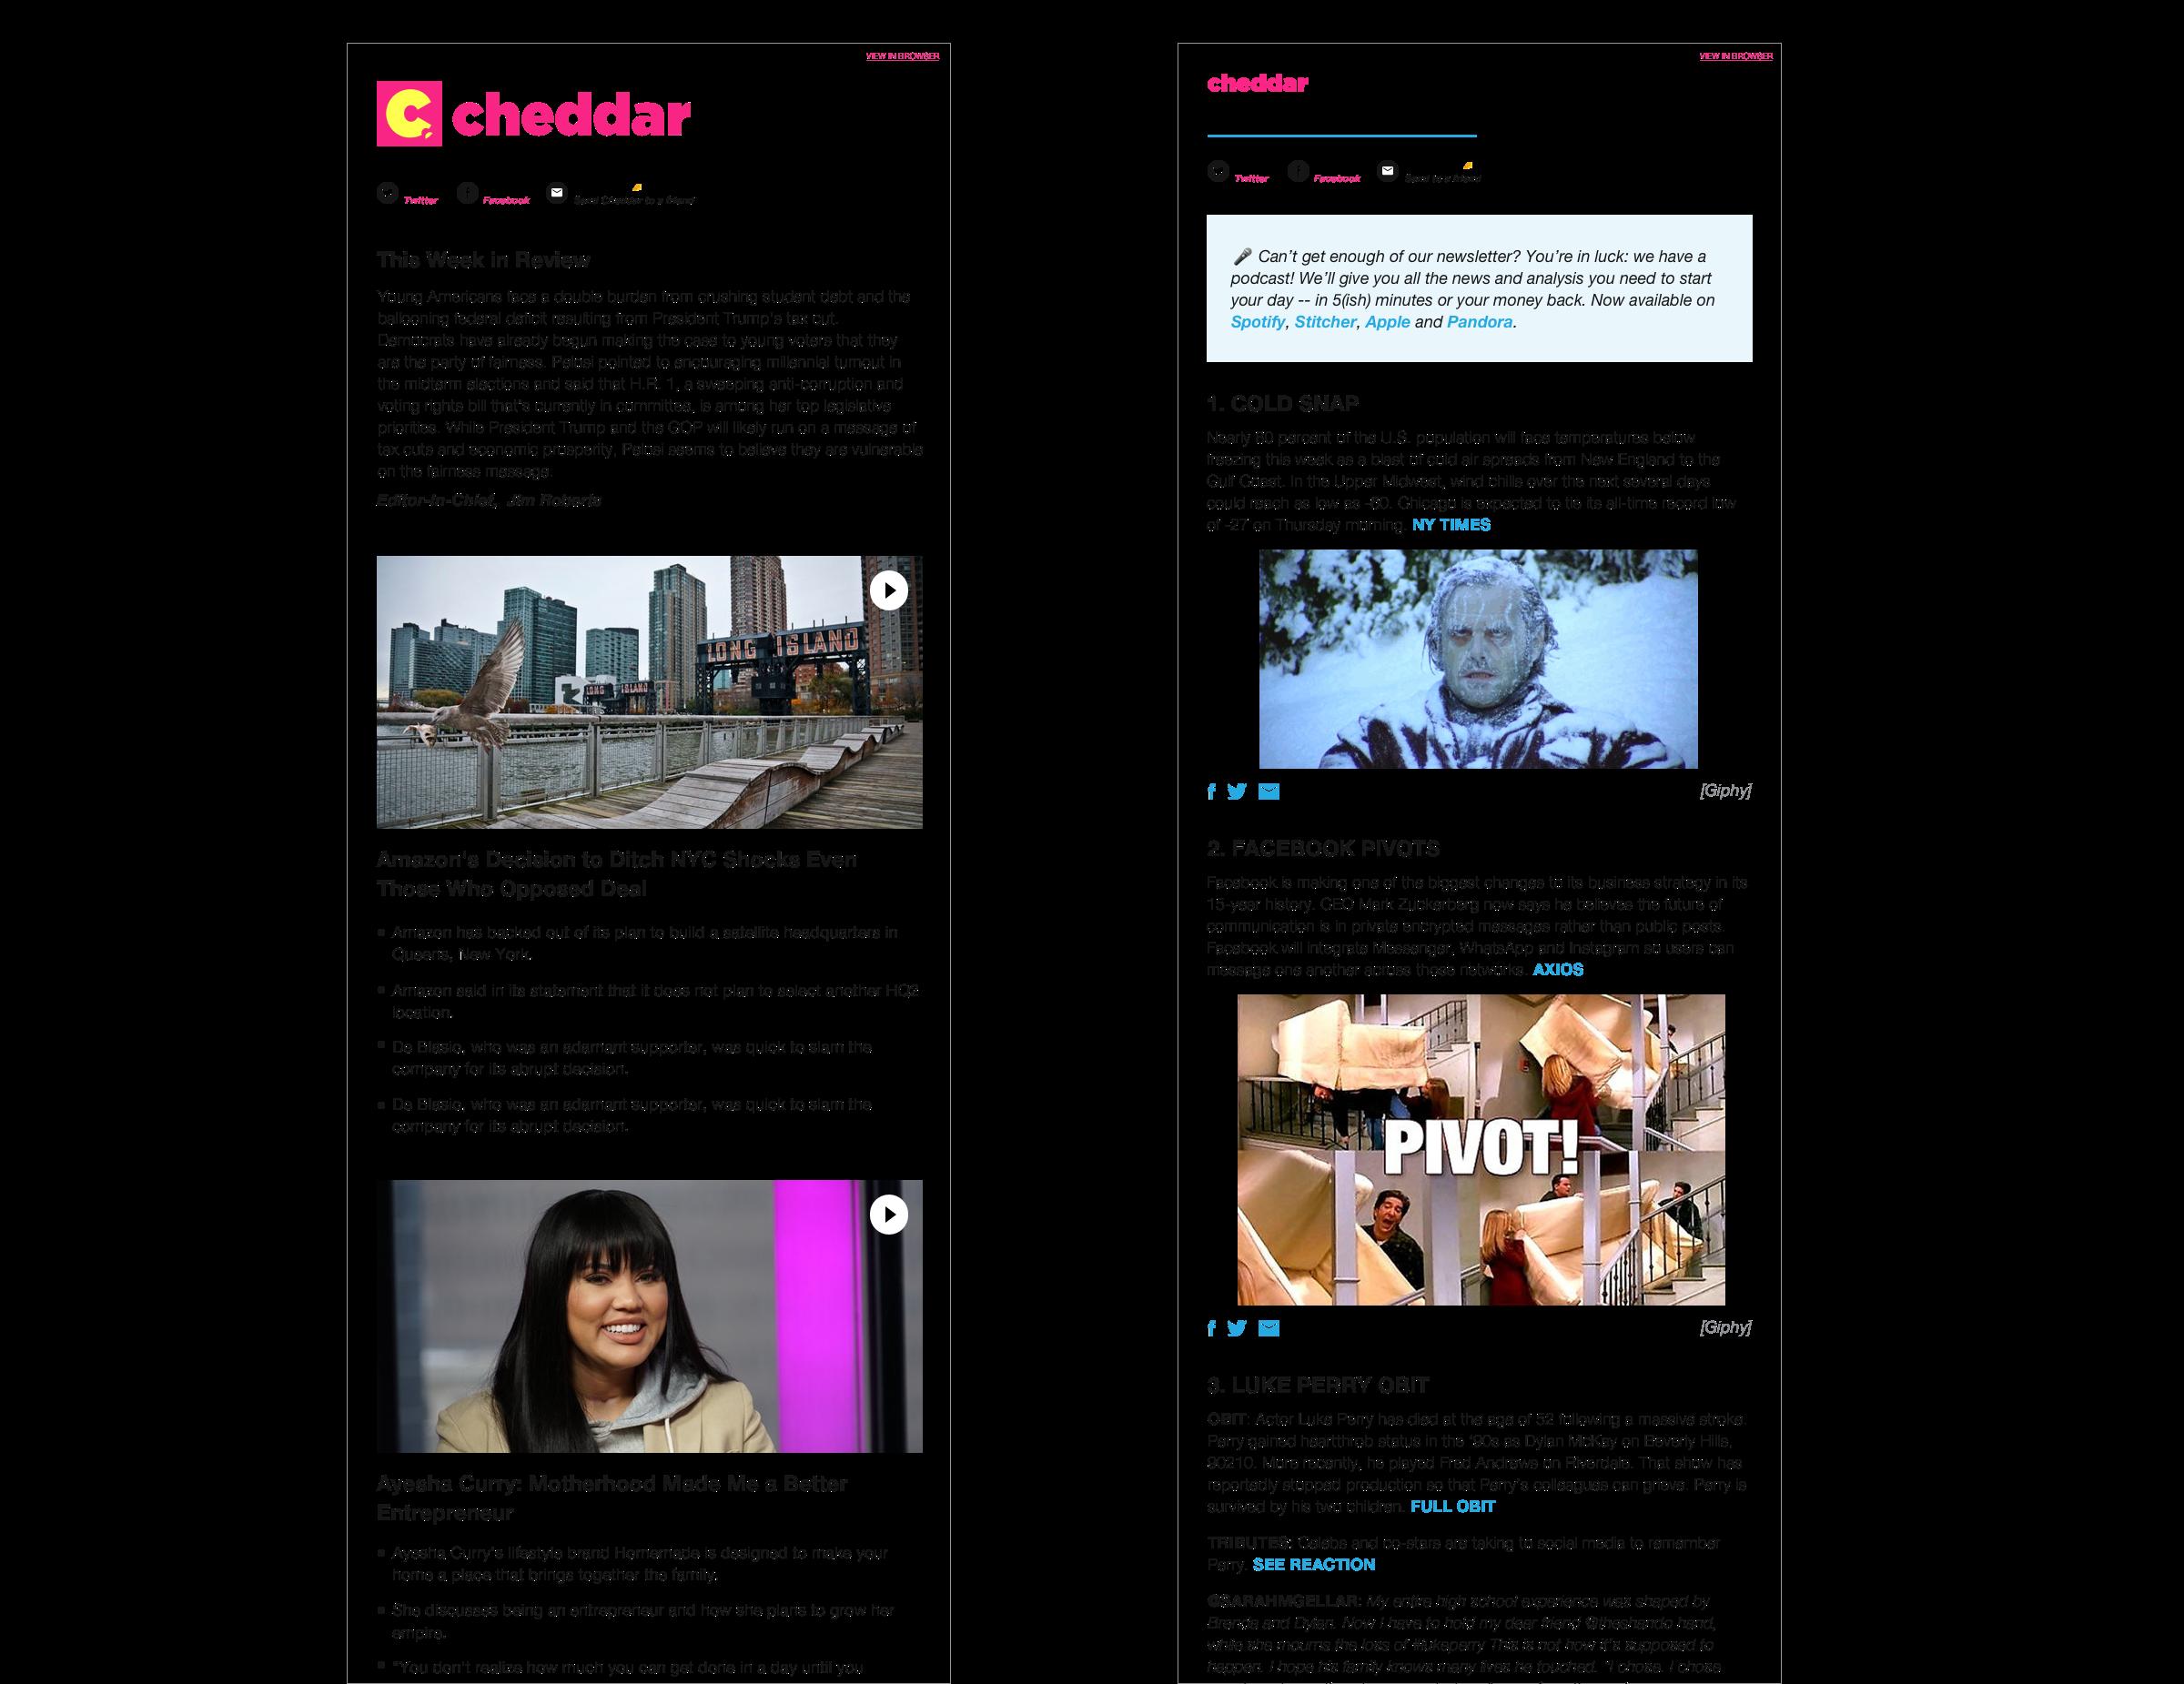 cheddar newsletters